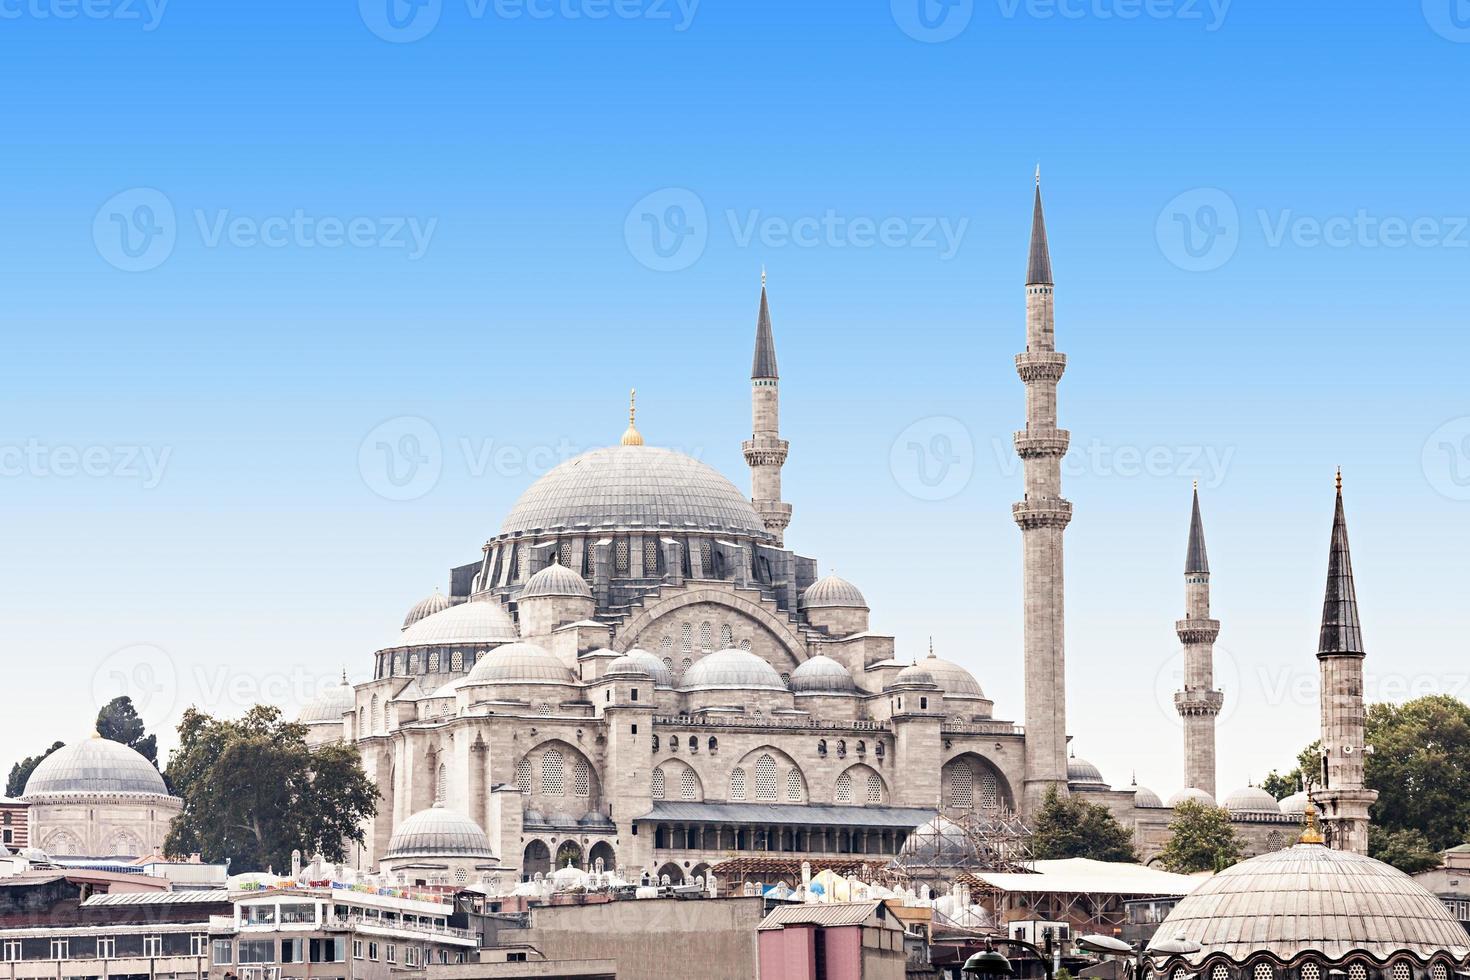 The Suleymaniye Mosque photo